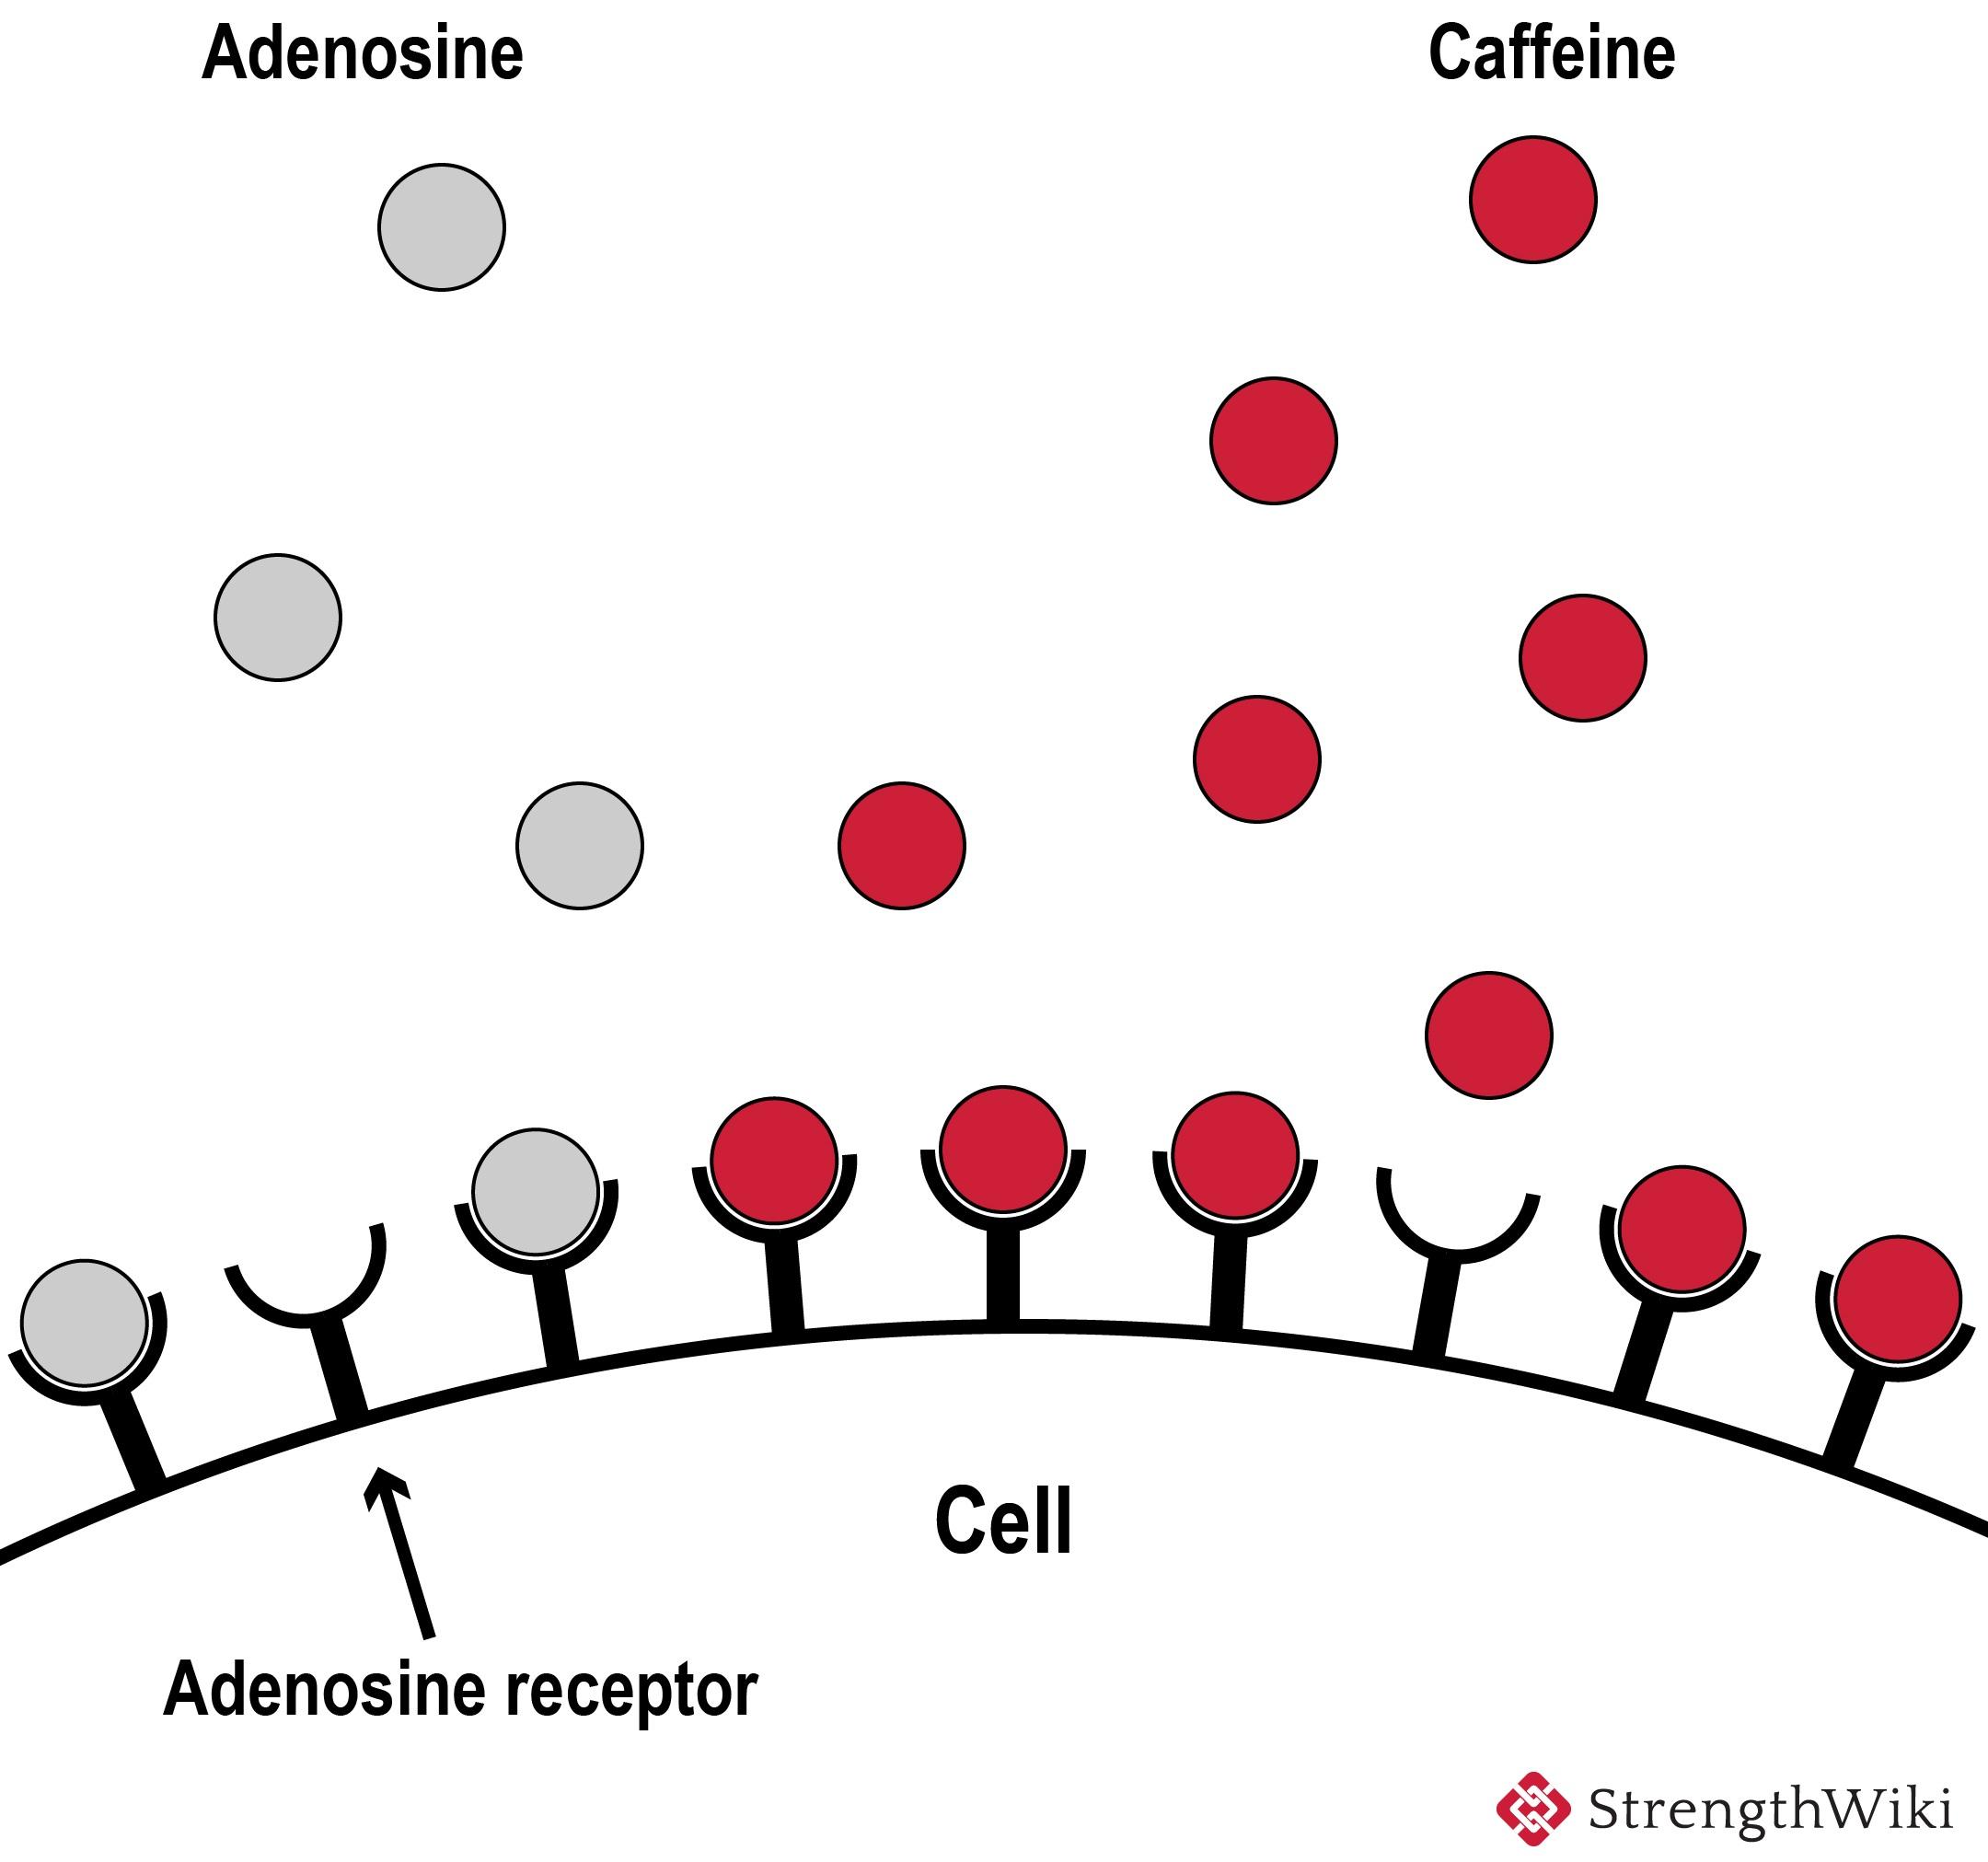 Caffeine blocking adenosine receptors